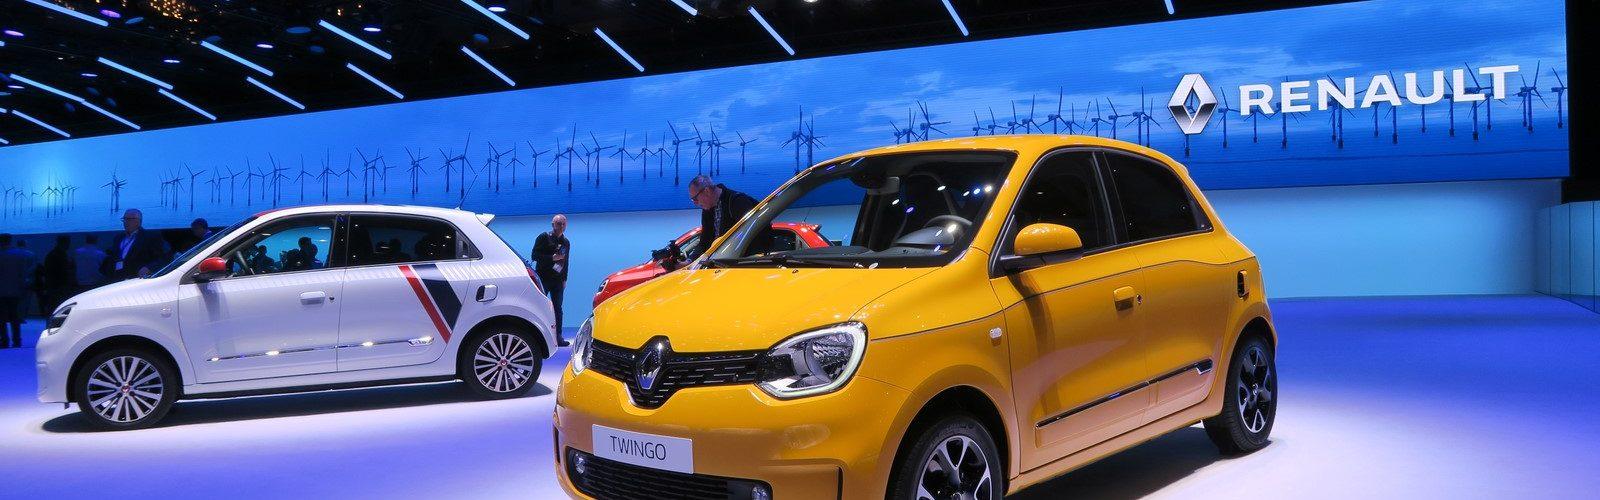 Renault Twingo III restylee LNA FM 2019 1